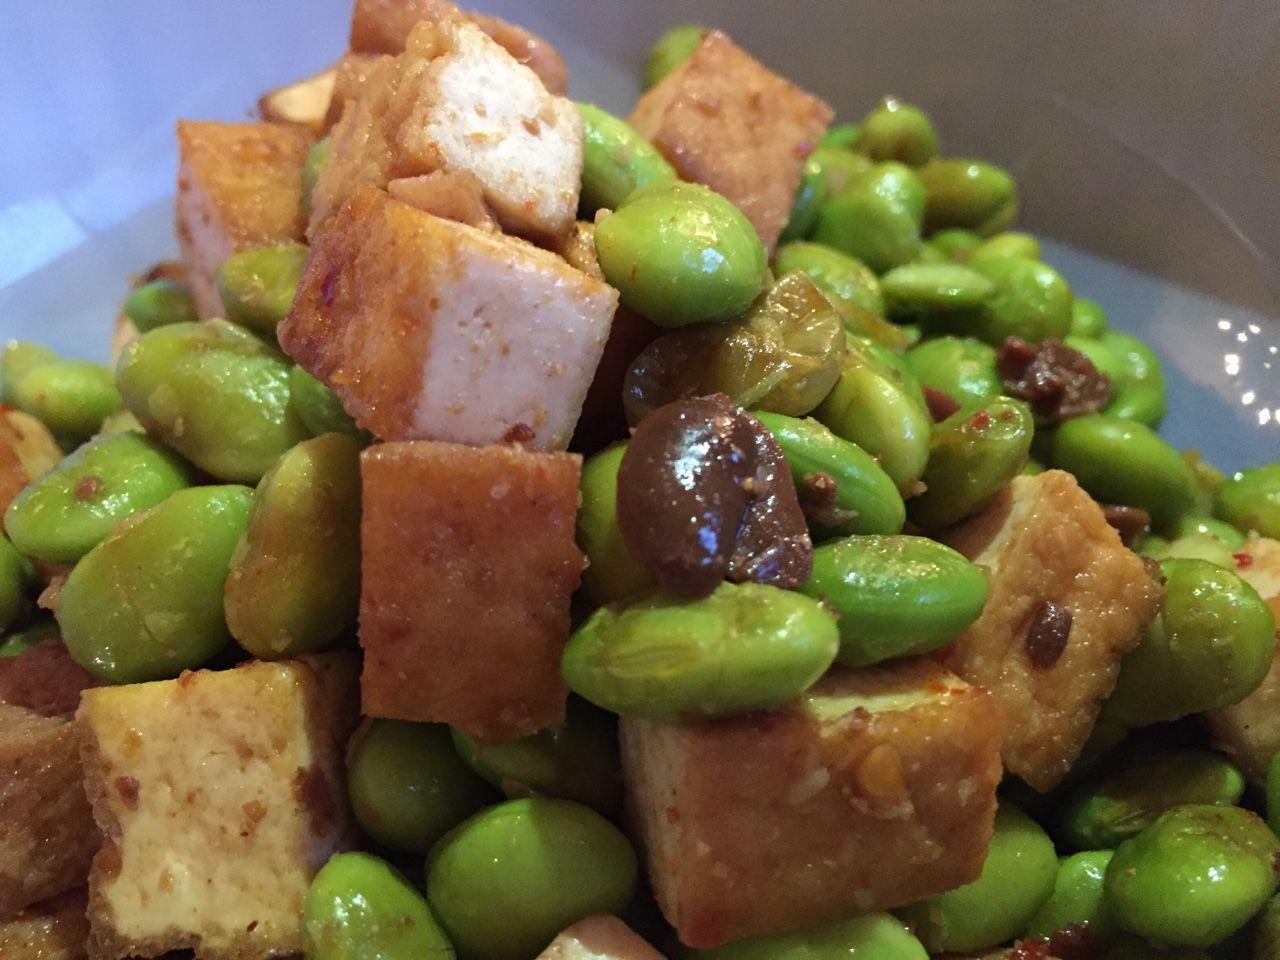 Asian Tofu Air Fryer Recipes